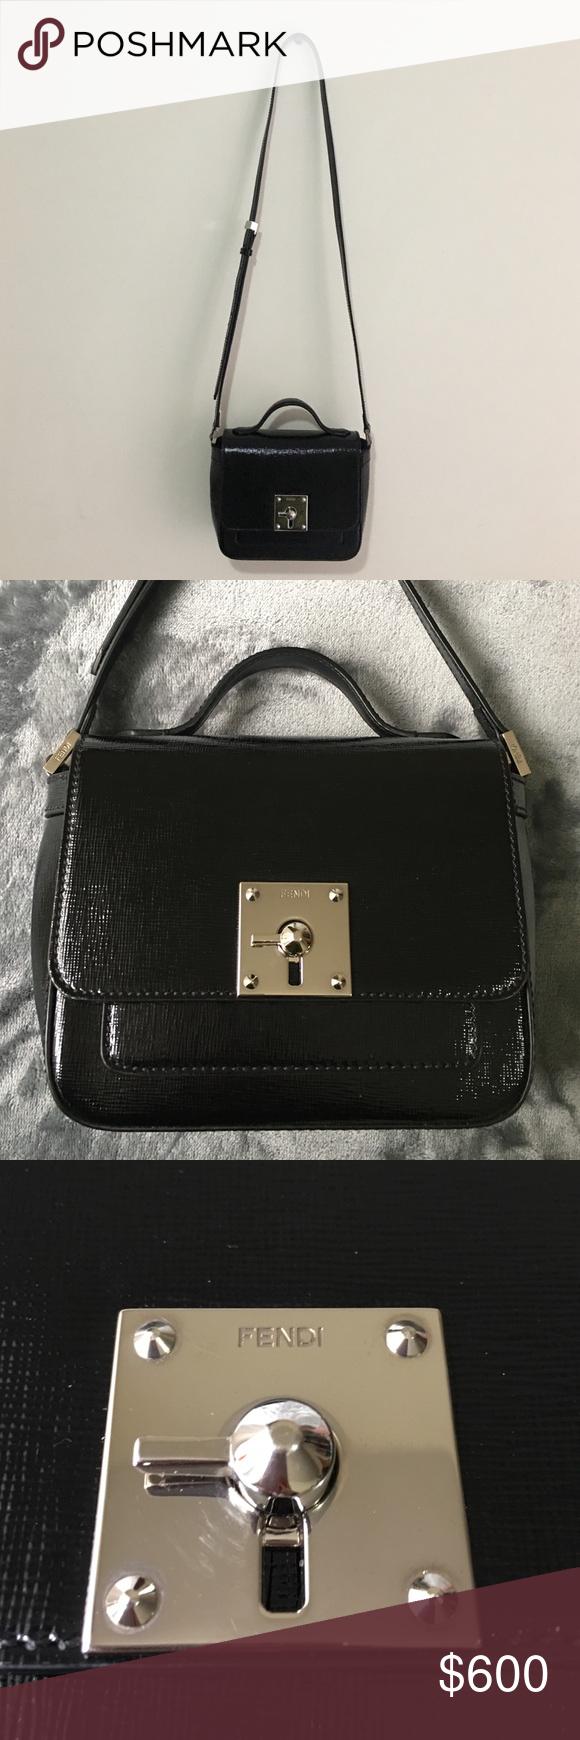 6fcf80c4ac1218 Fendi Mini Borsa Leather Crossbody Bag Fendi Mini Borsa Leather Crossbody  Bag. Stamped leather with